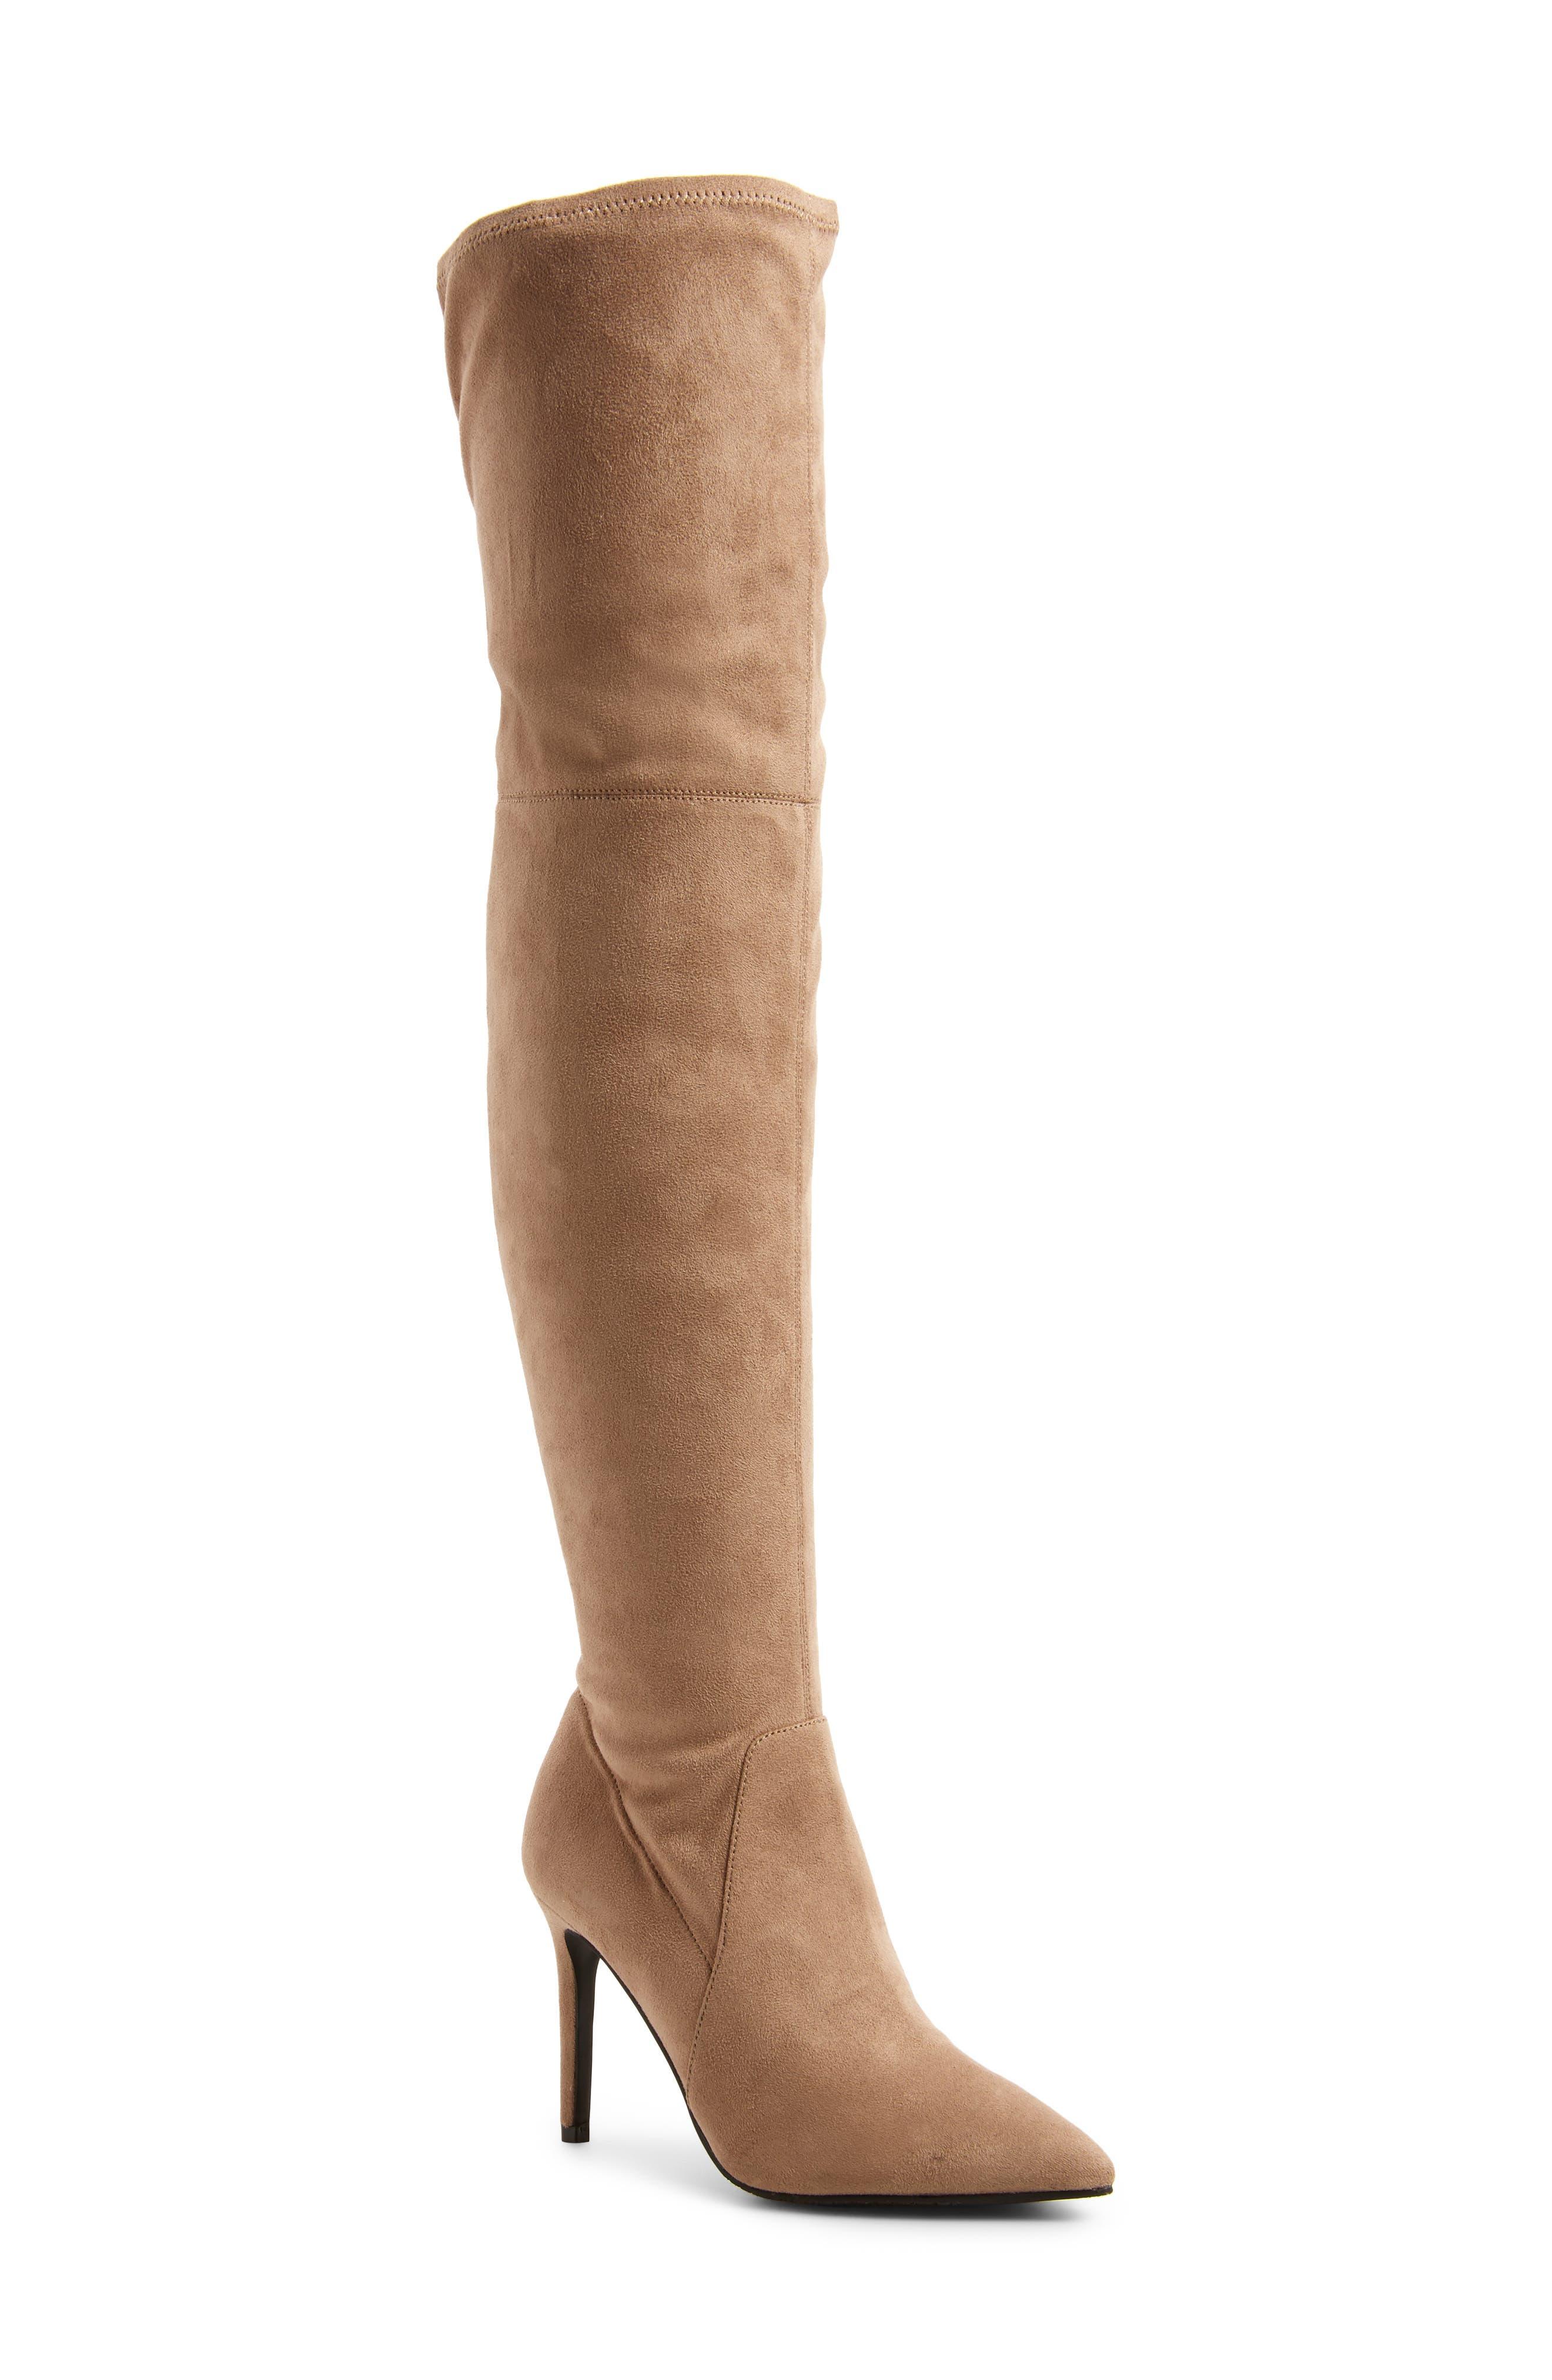 Alternate Image 1 Selected - BP. Fab Nara Over the Knee Boot (Women)